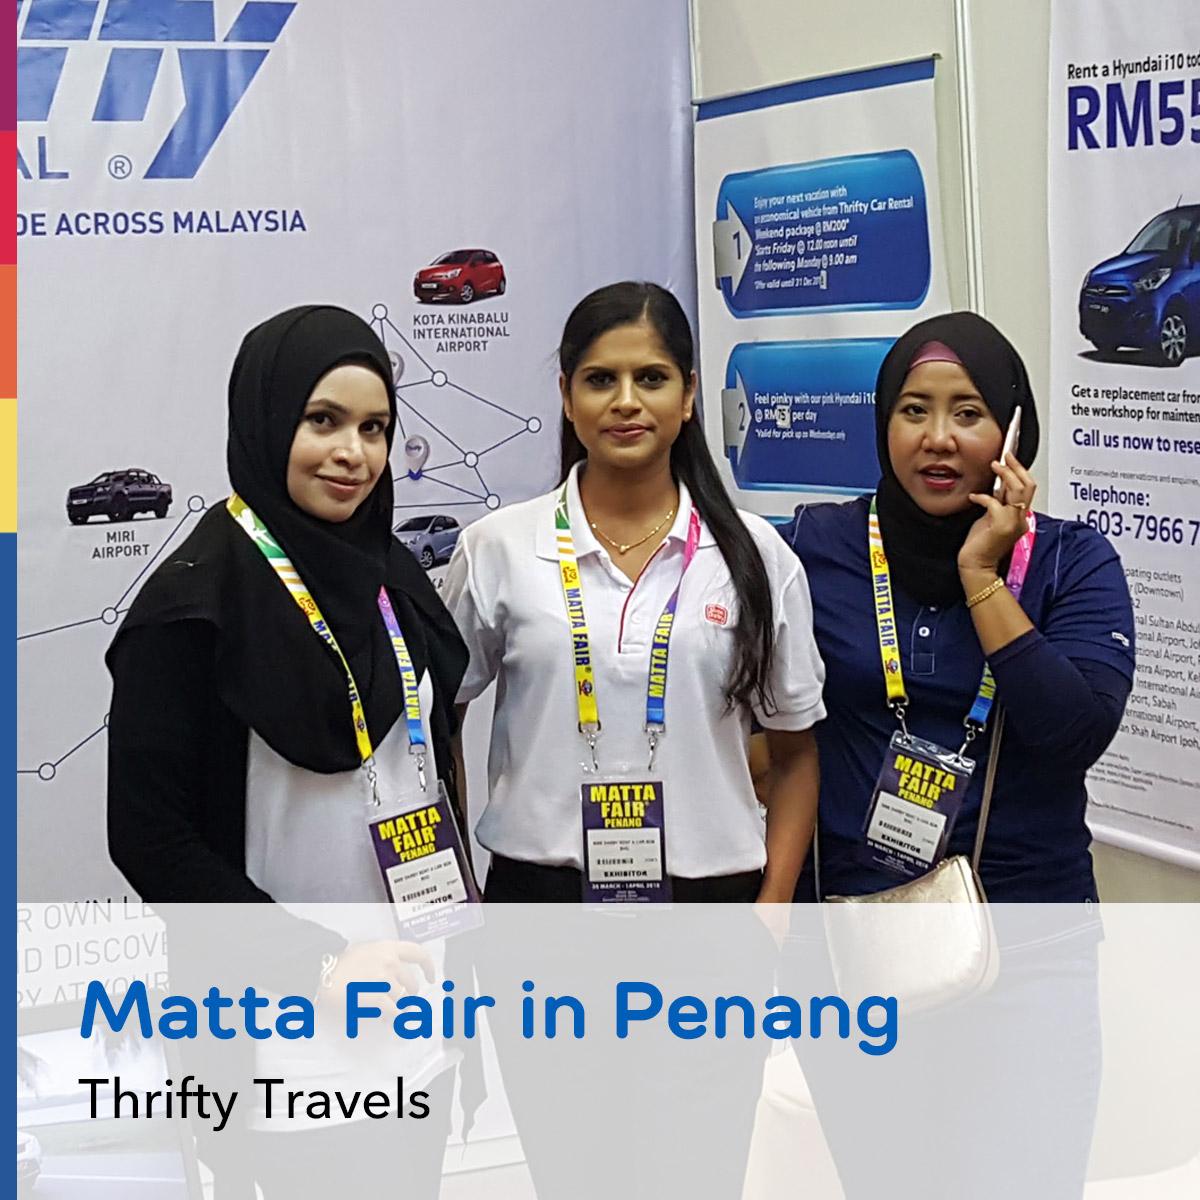 Matta Fair in Penang